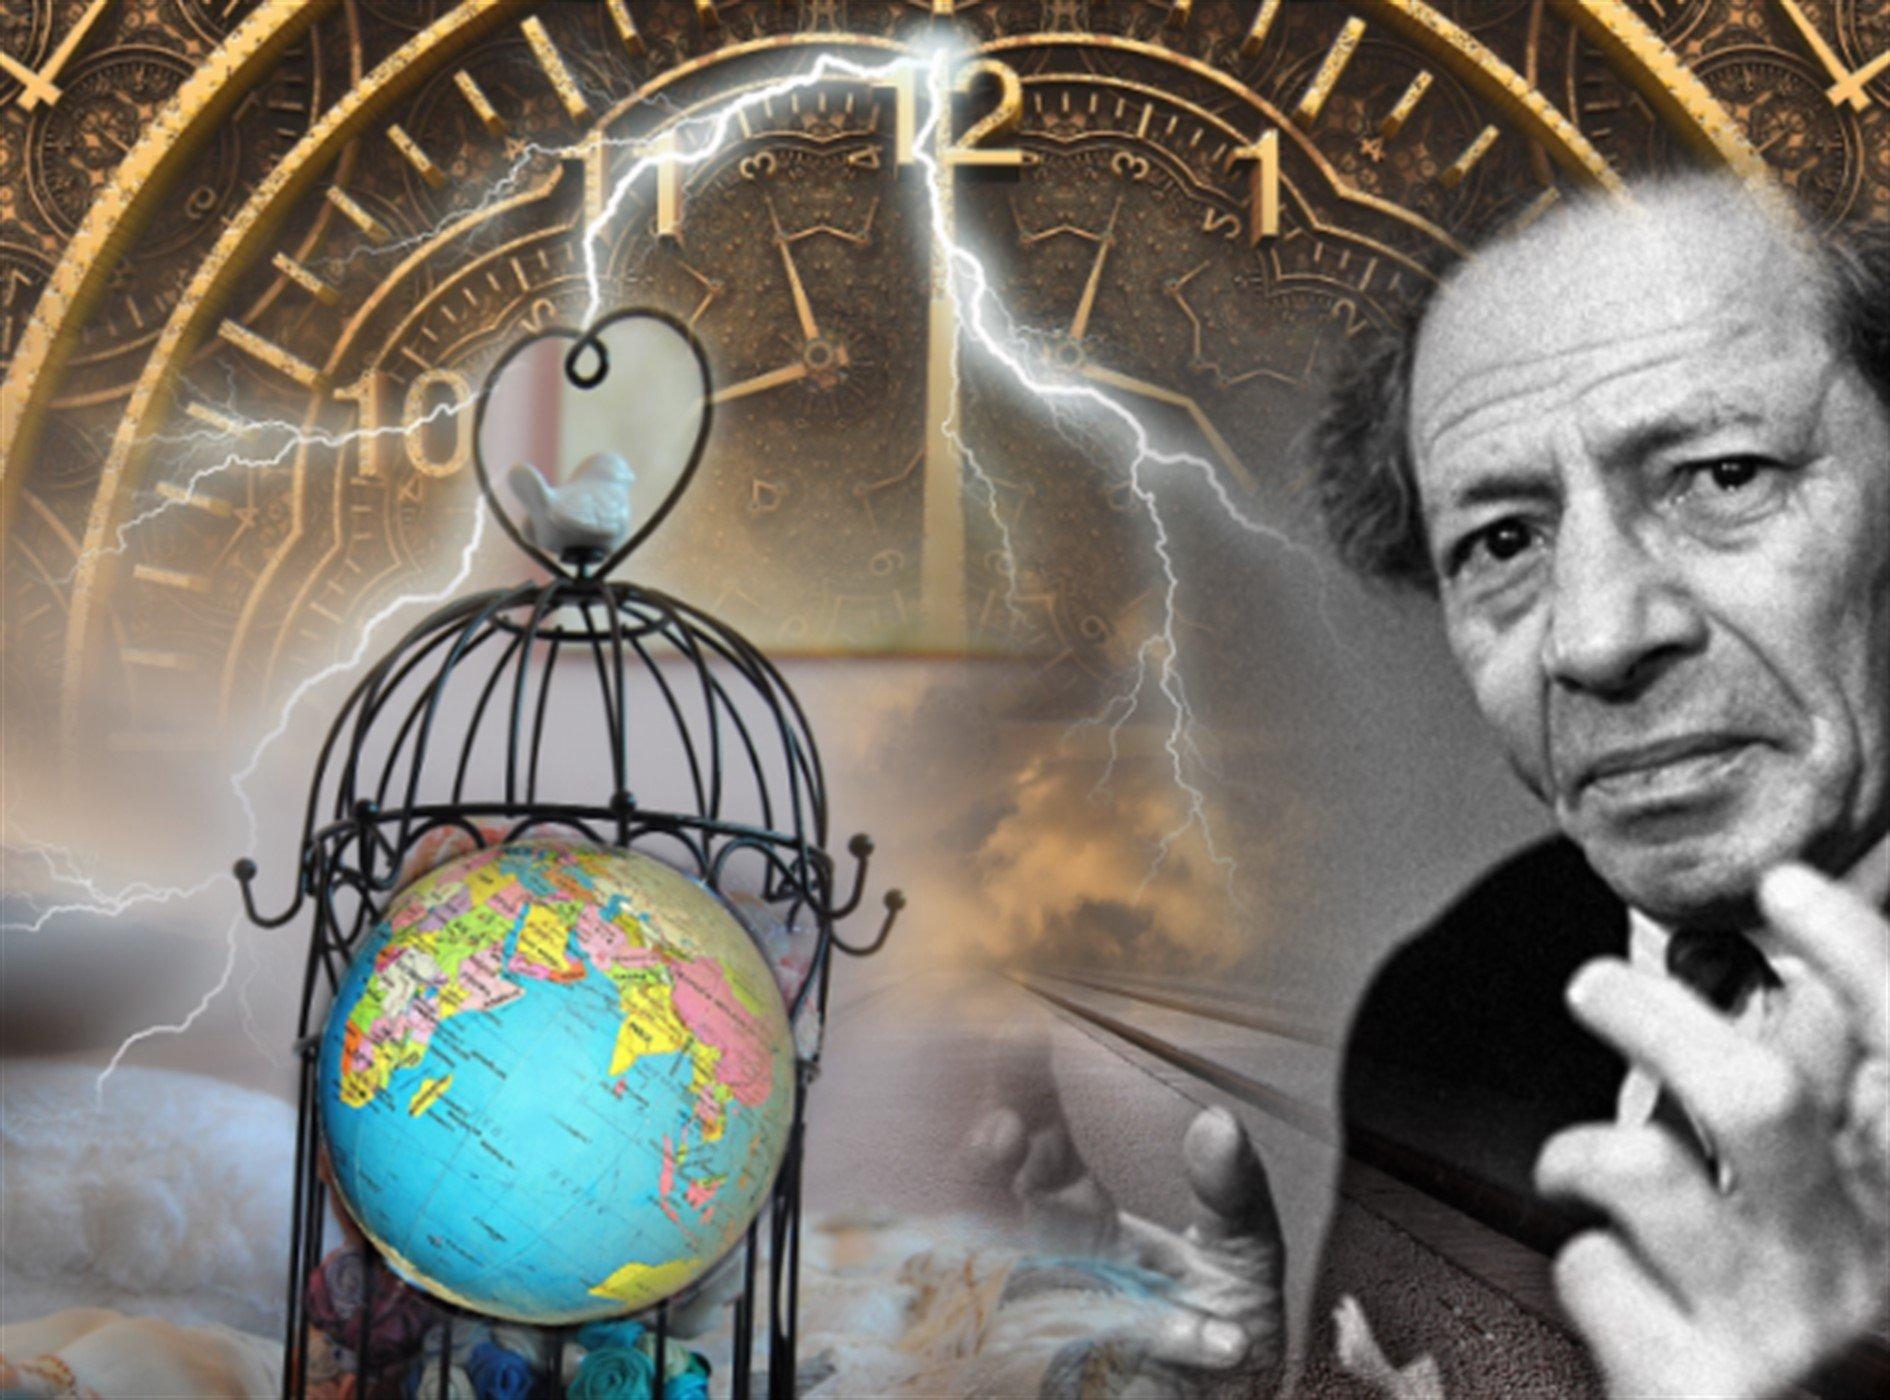 prorochestva-messinga-na-2021-god-na-zemlyu-pridet-velikij-prorok